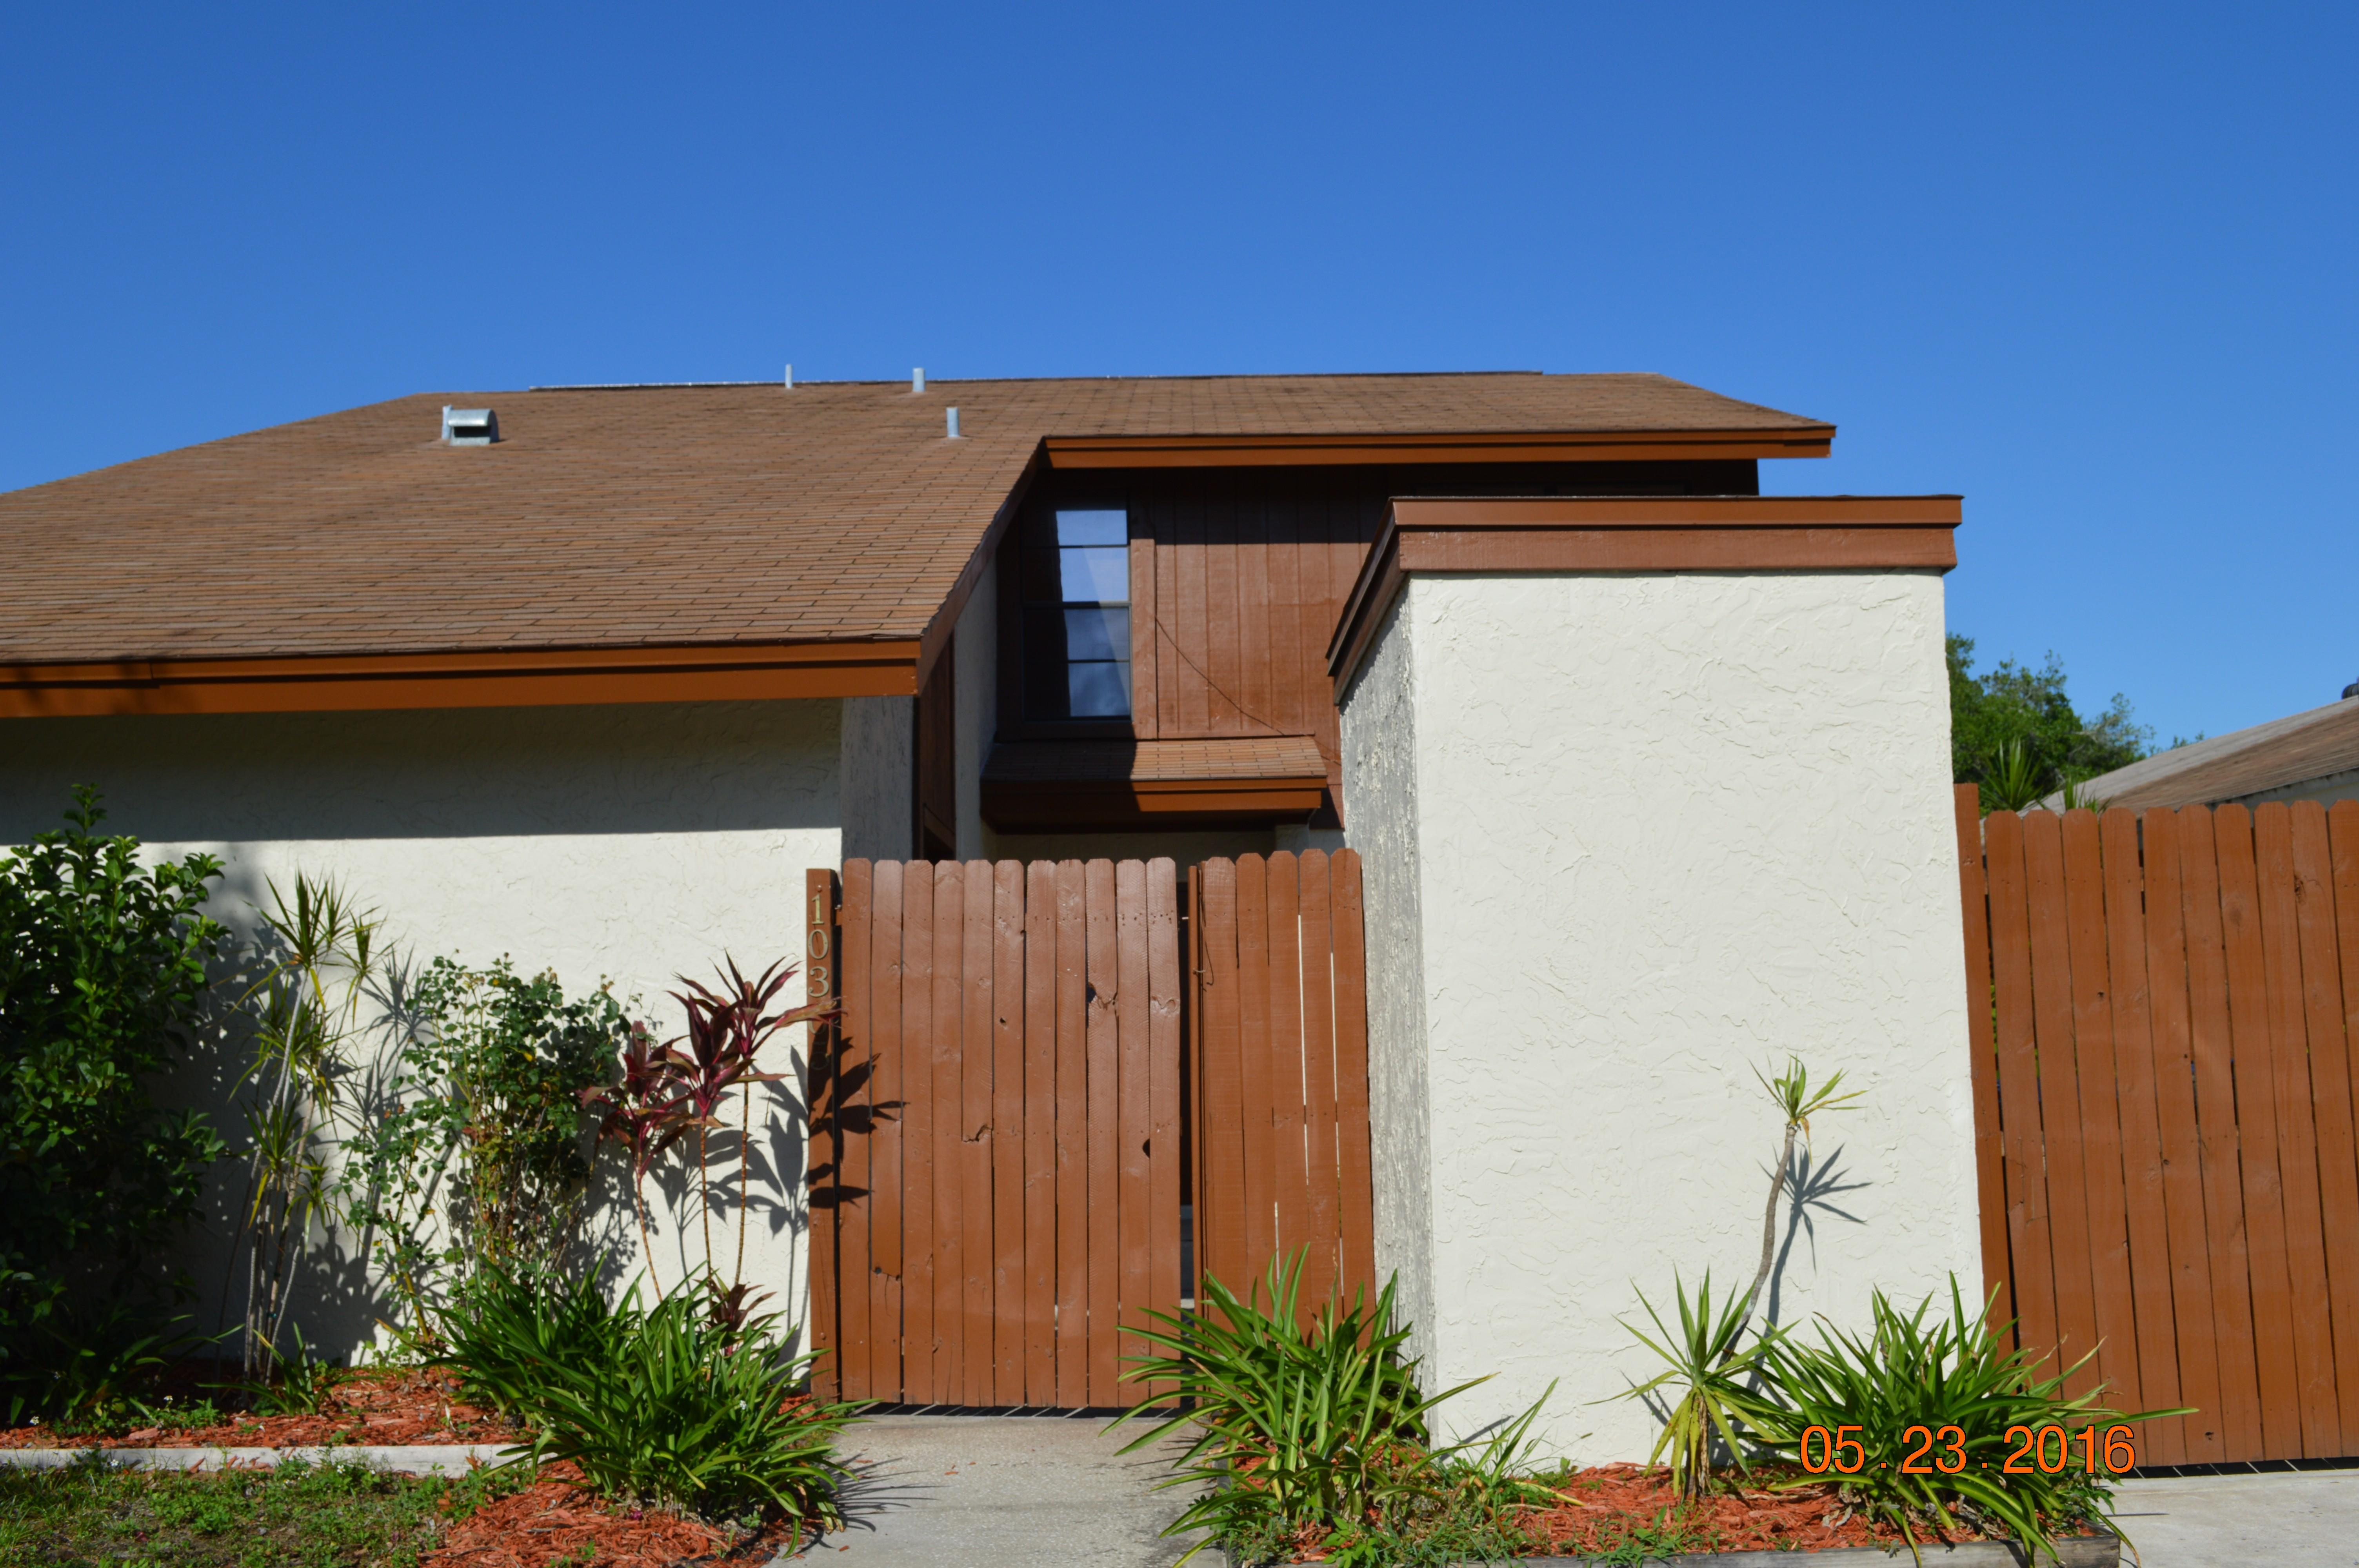 10145 Cedar Dune Dr Tampa Fl 33624 3 Bedroom Apartment For Rent Padmapper